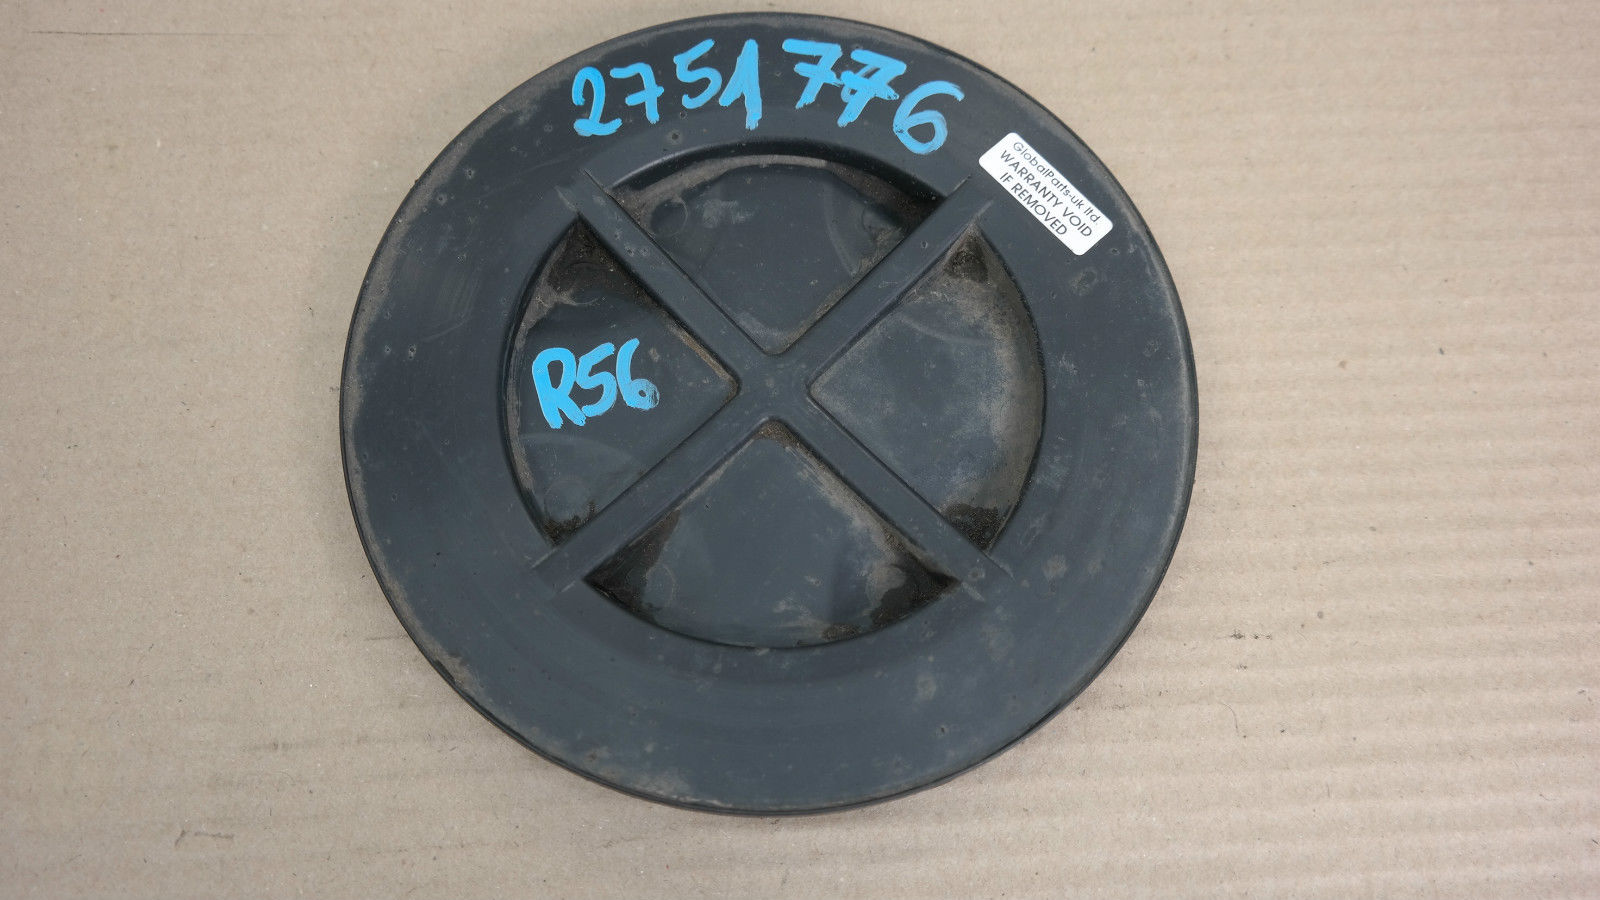 мини r55 r56 крышка заглушка крышка колеса